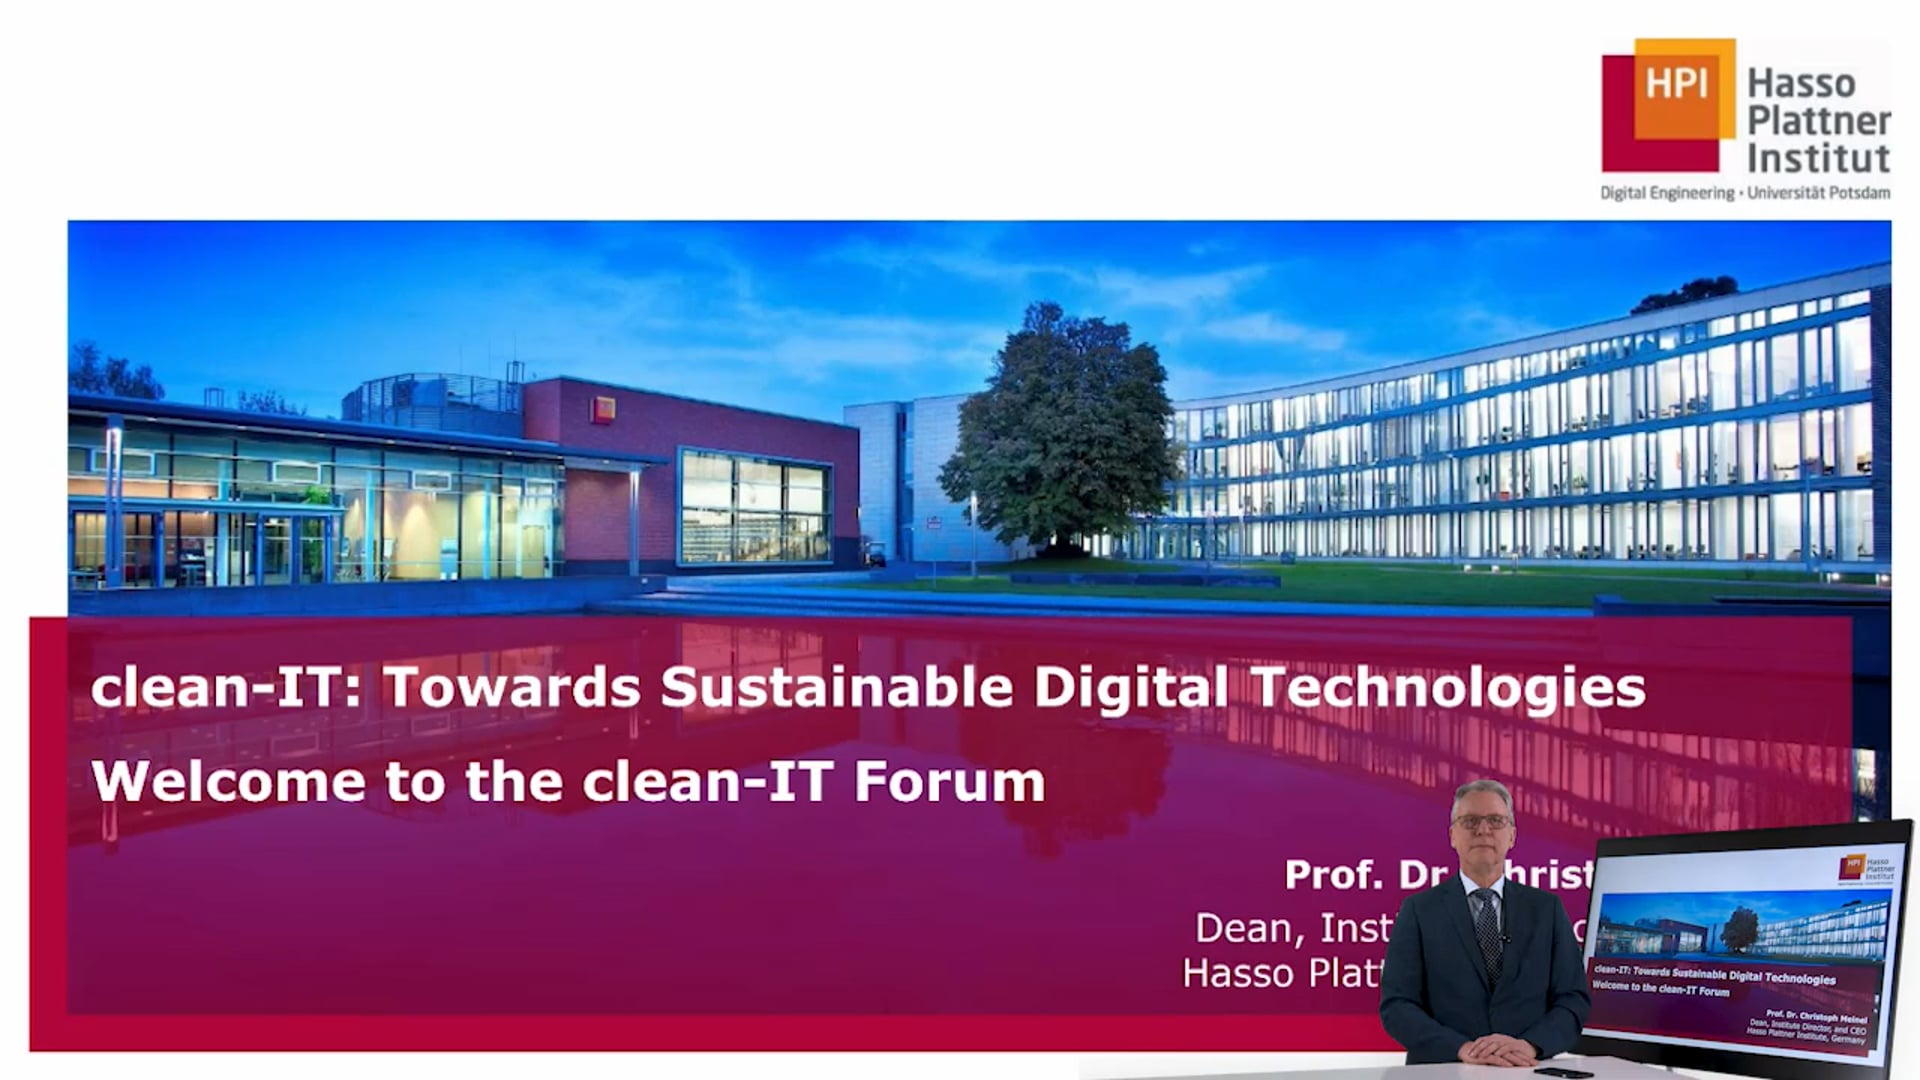 Christoph Meinel (HPI) - Environmental Impact of Digitalization